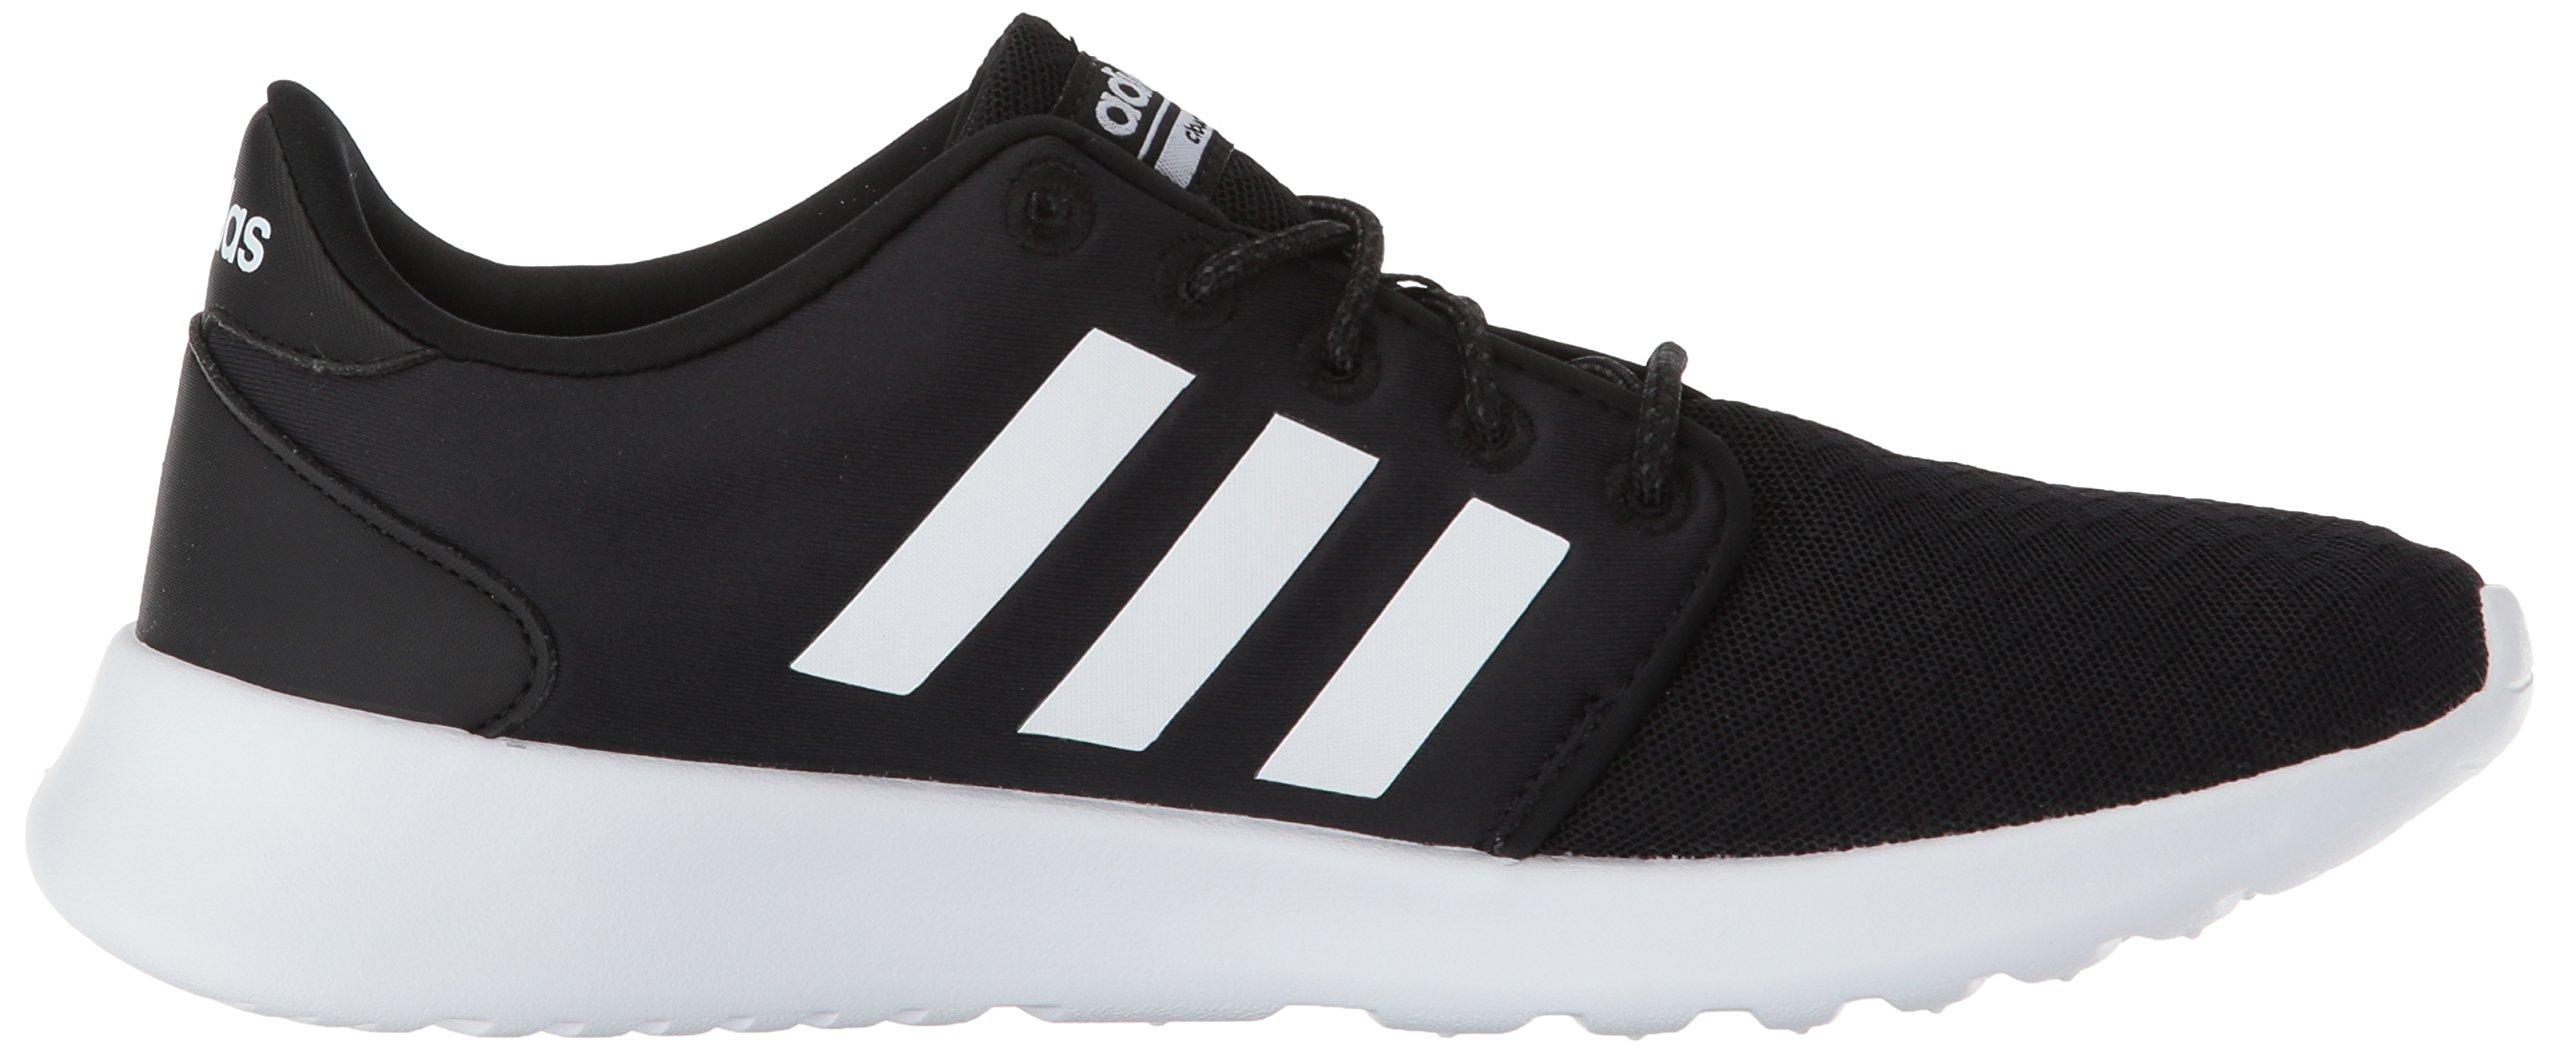 adidas Women's Cloudfoam QT Racer Running Shoe, Black/White/Carbon, 5 M US by adidas (Image #7)